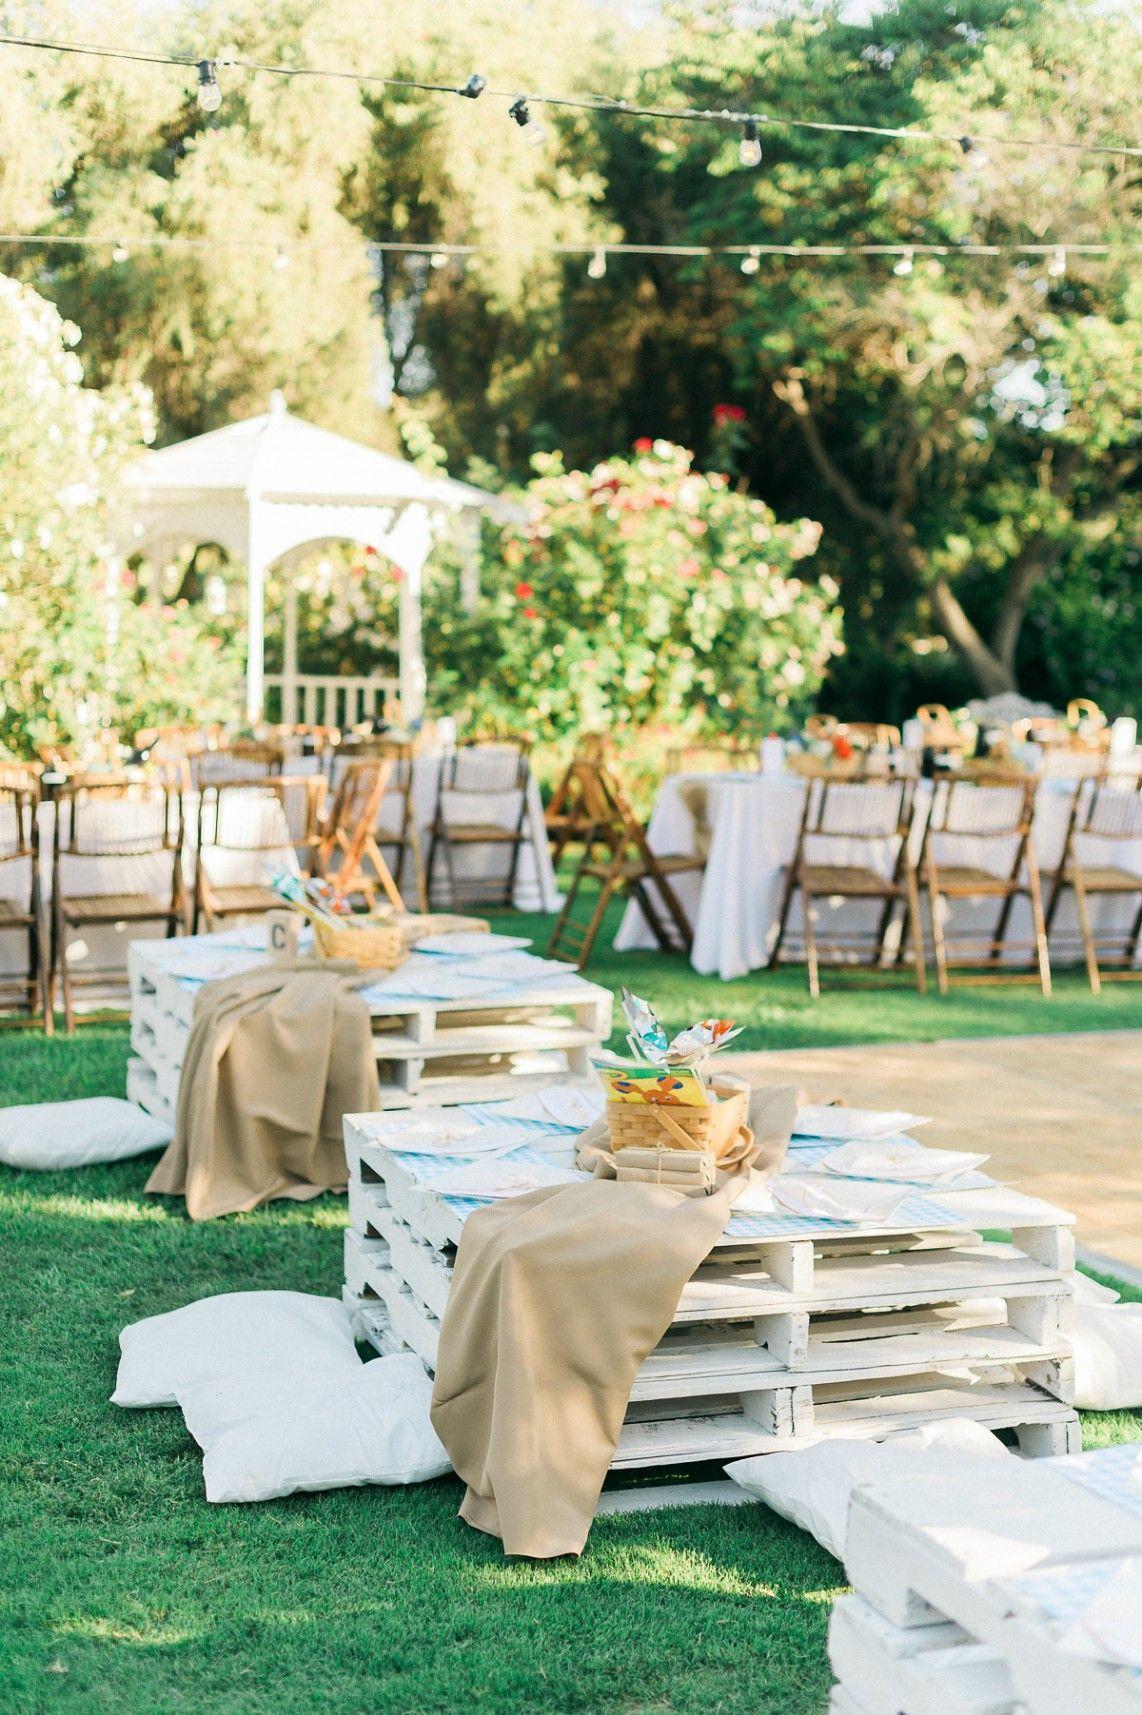 Cute Picnic California Wedding California Wedding Picnics And